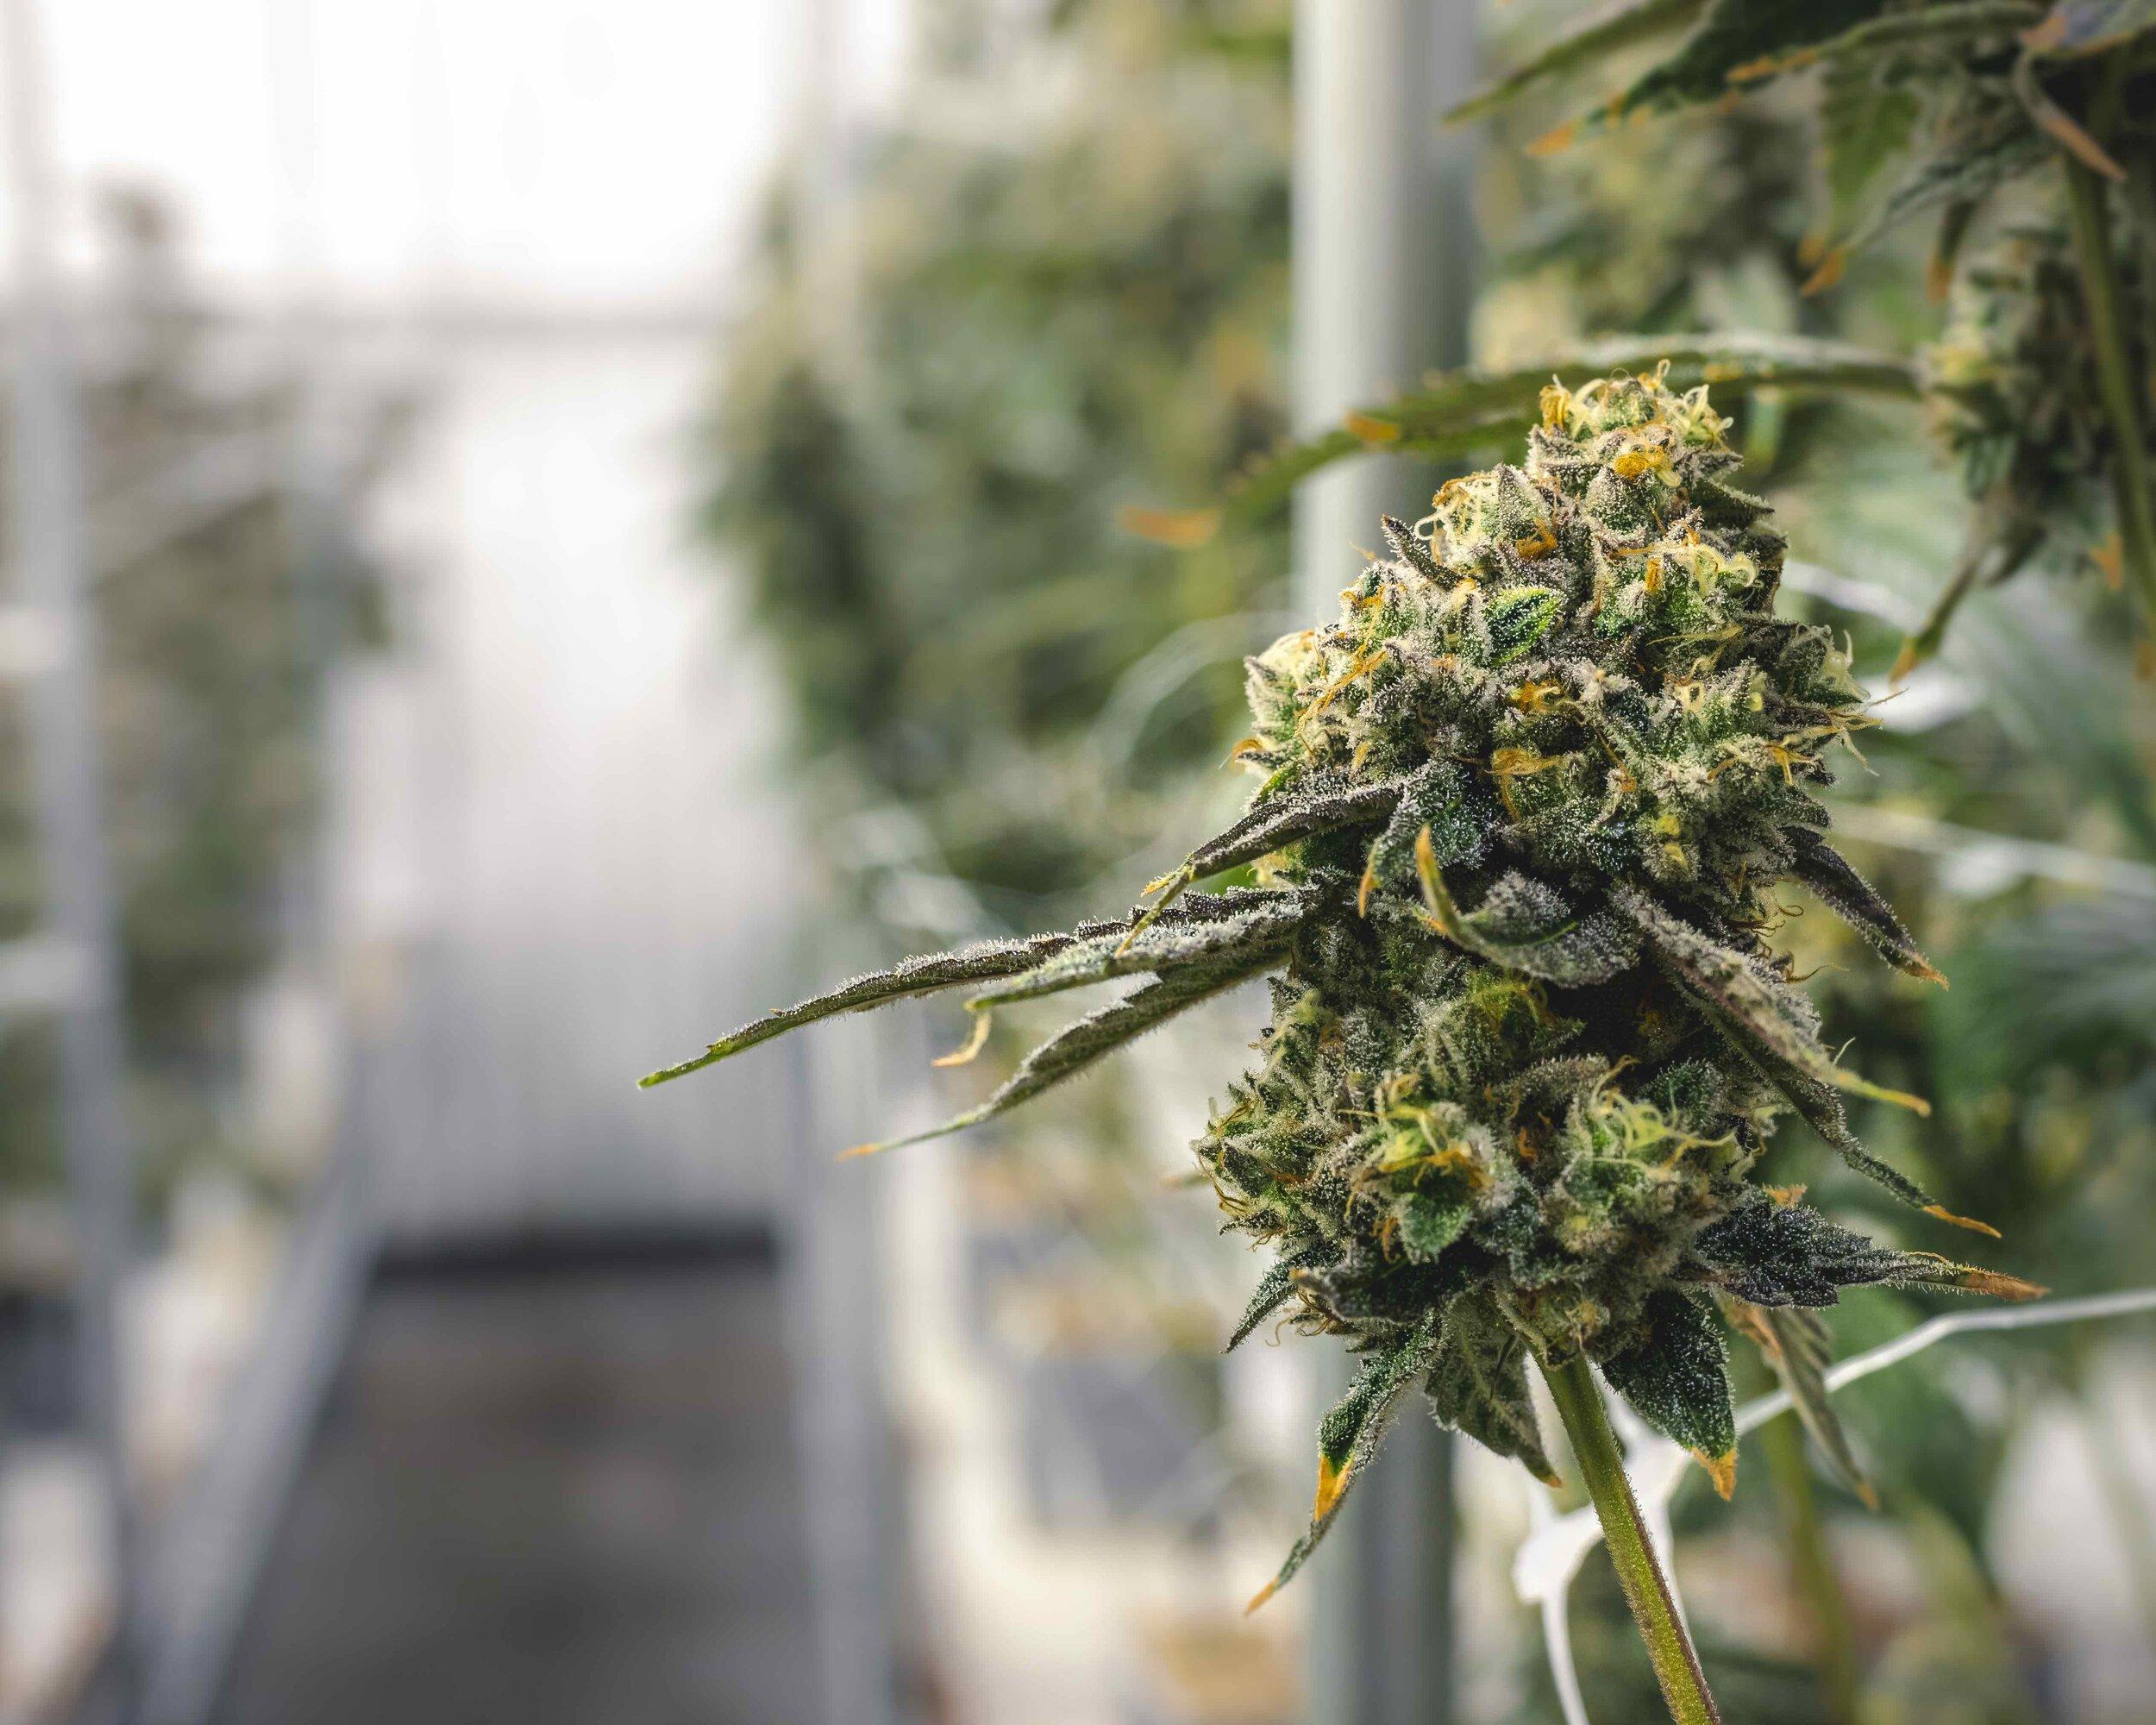 Macro_Marijuana_Bud_at_Cannabis_Industry_Farm_Growing_for_Legal_Dispensary_Sales.jpeg